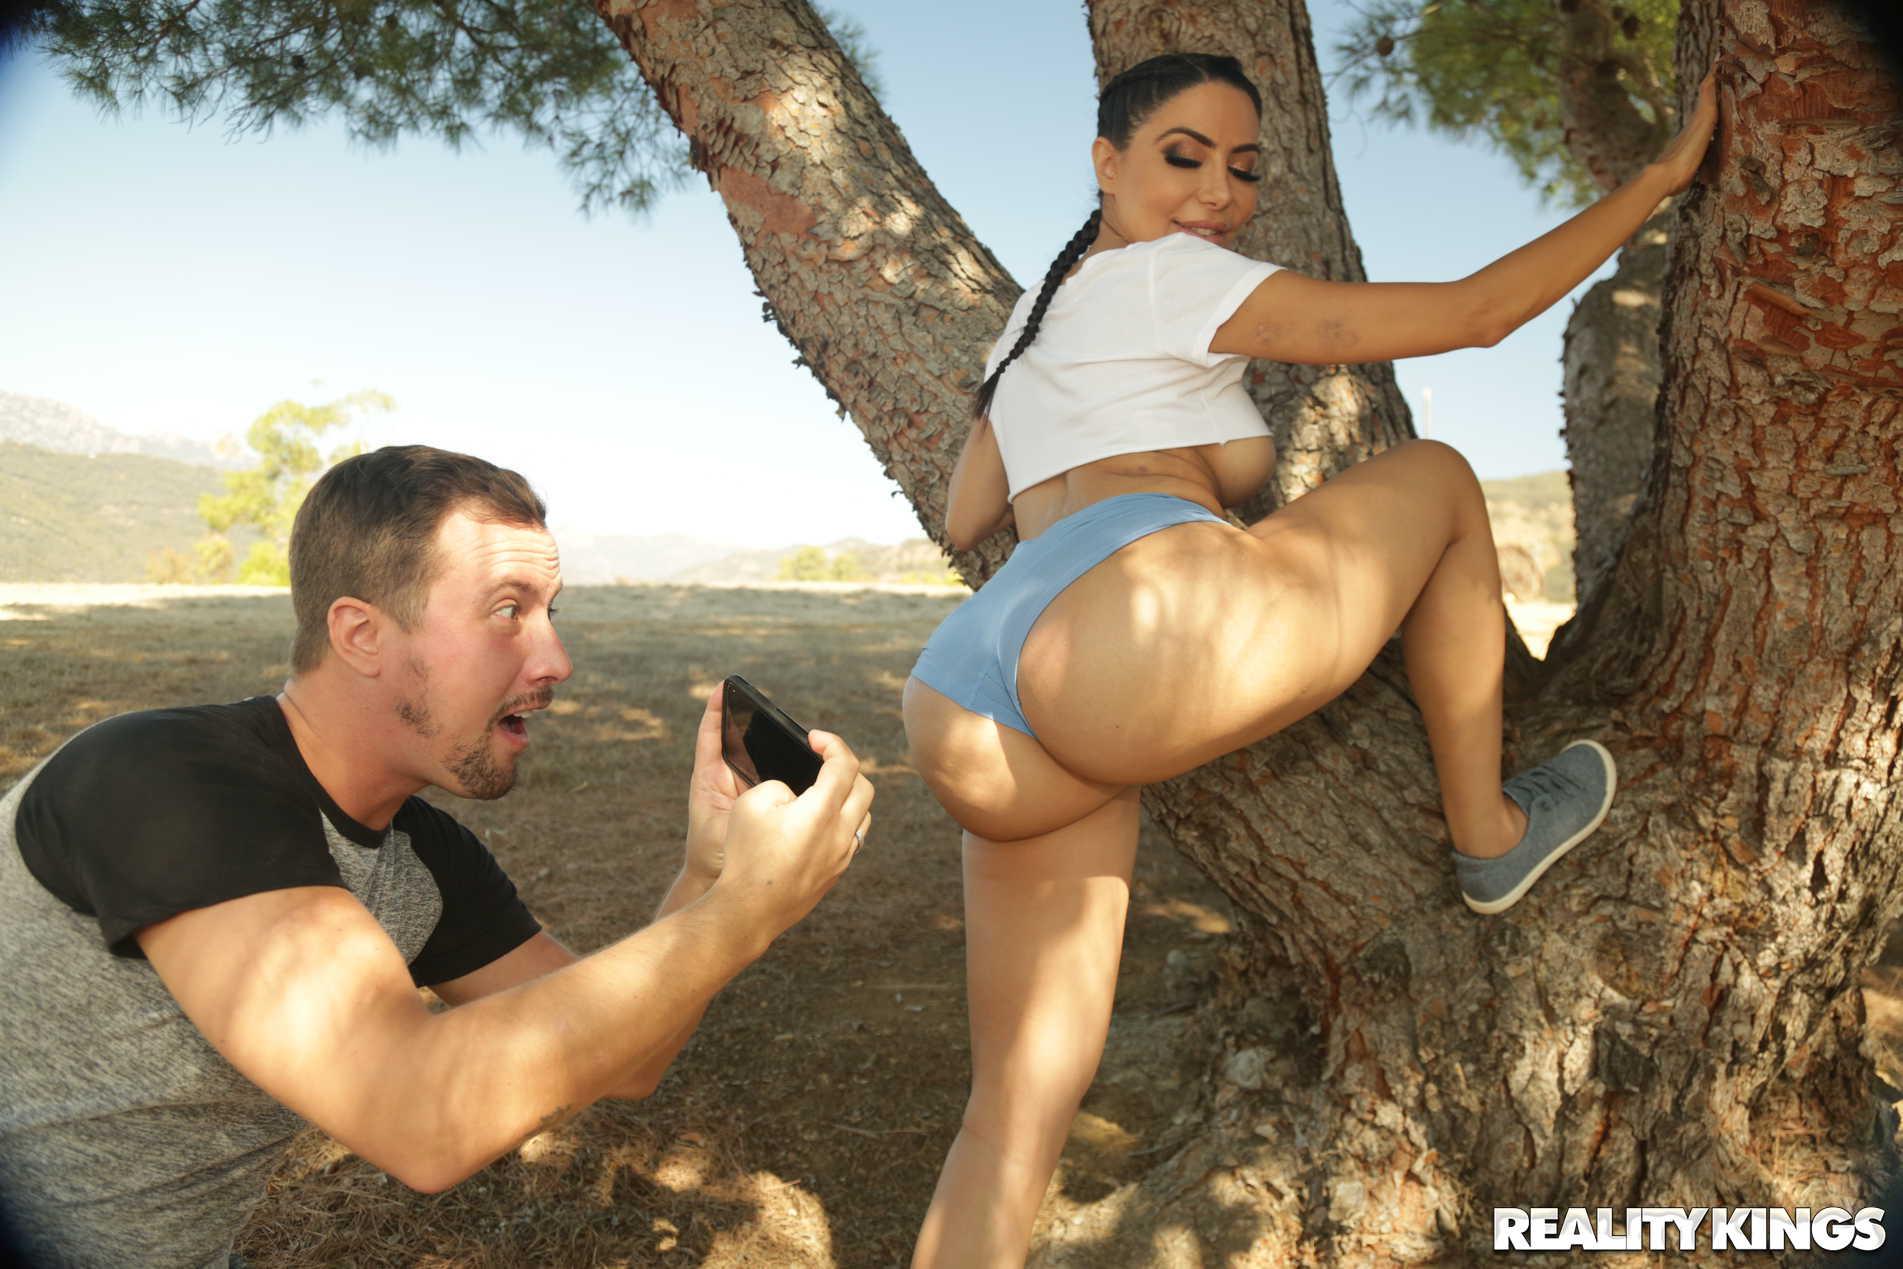 Reality Kings 'Hike That Ass' starring Lela Star (Photo 56)